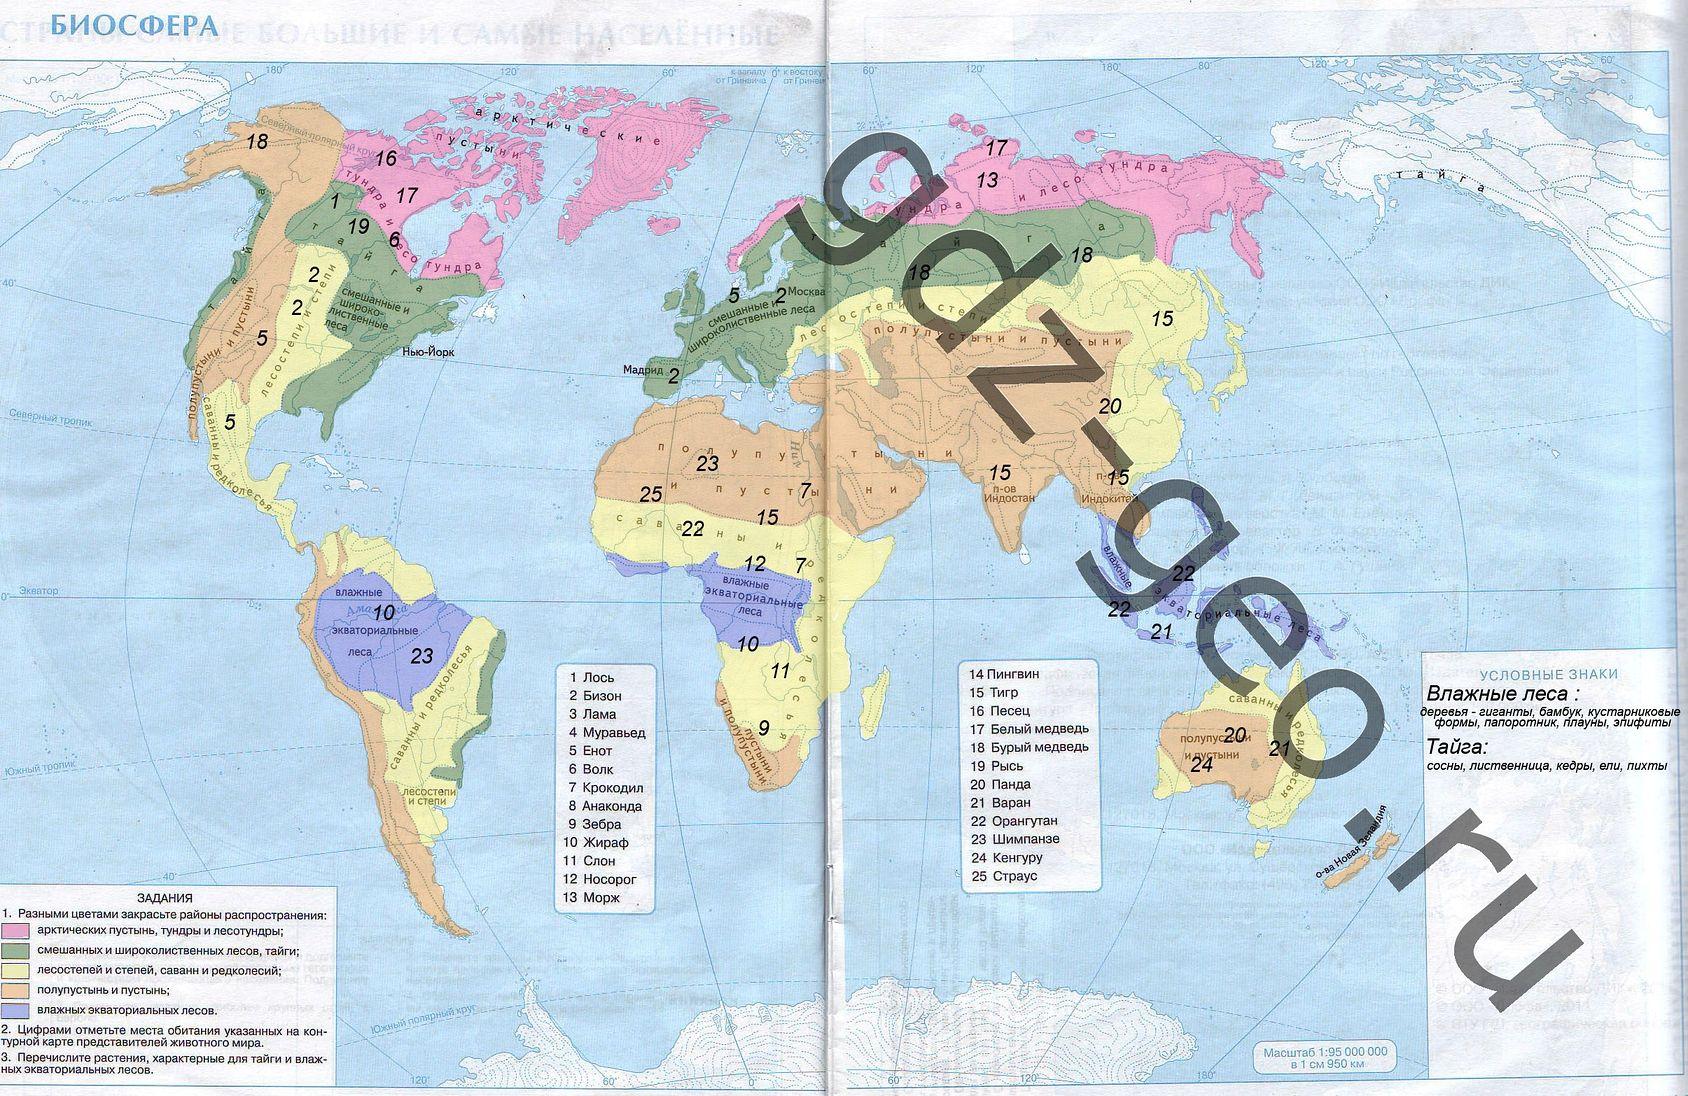 атлас географии 8 класс дрофа онлайн